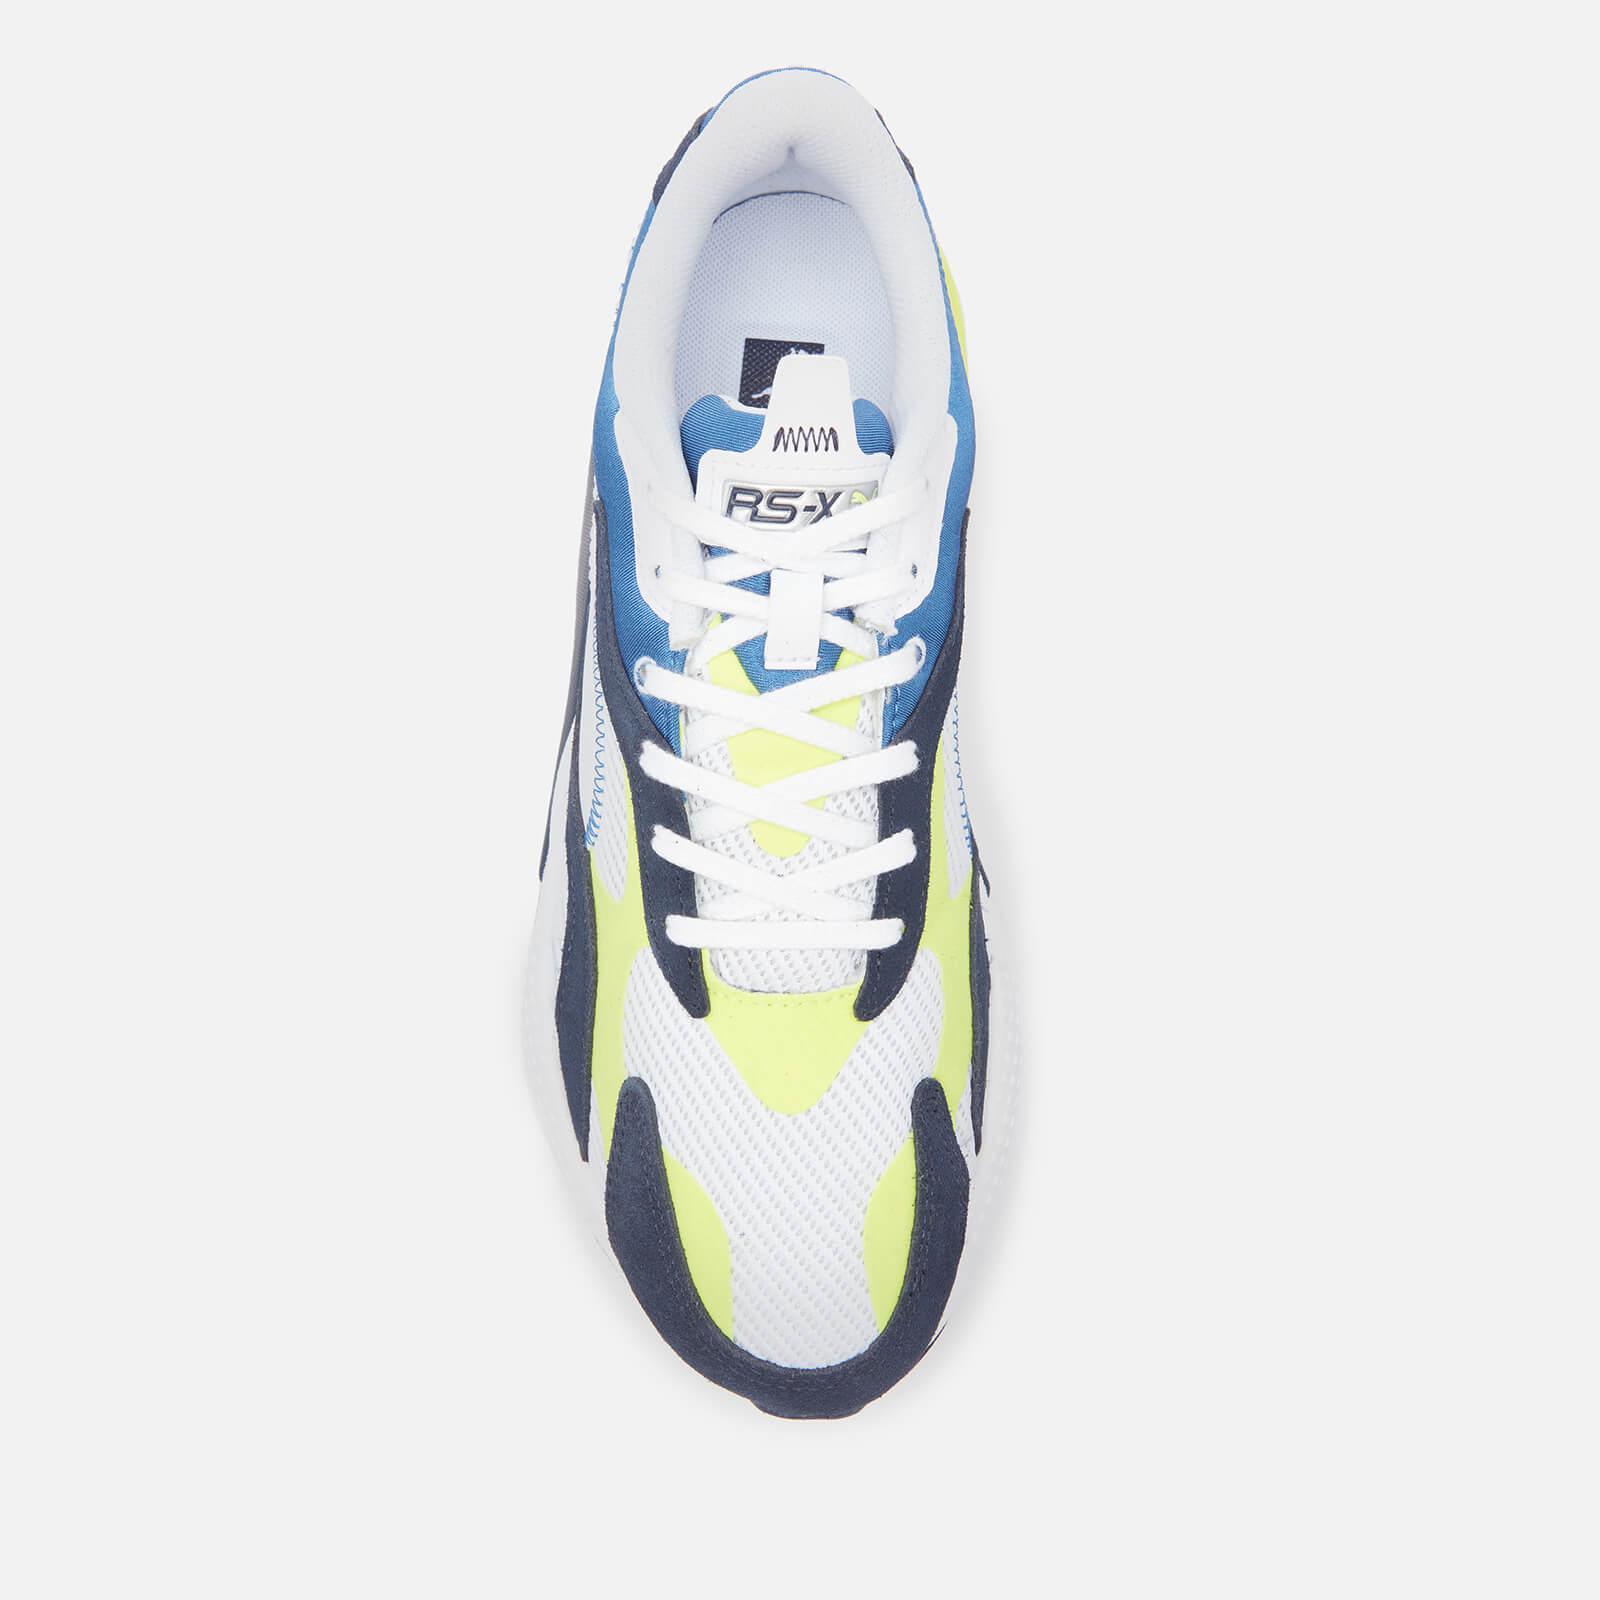 puma men's rs x3 twill airmes running style trainers - puma white/peacoat - uk 7